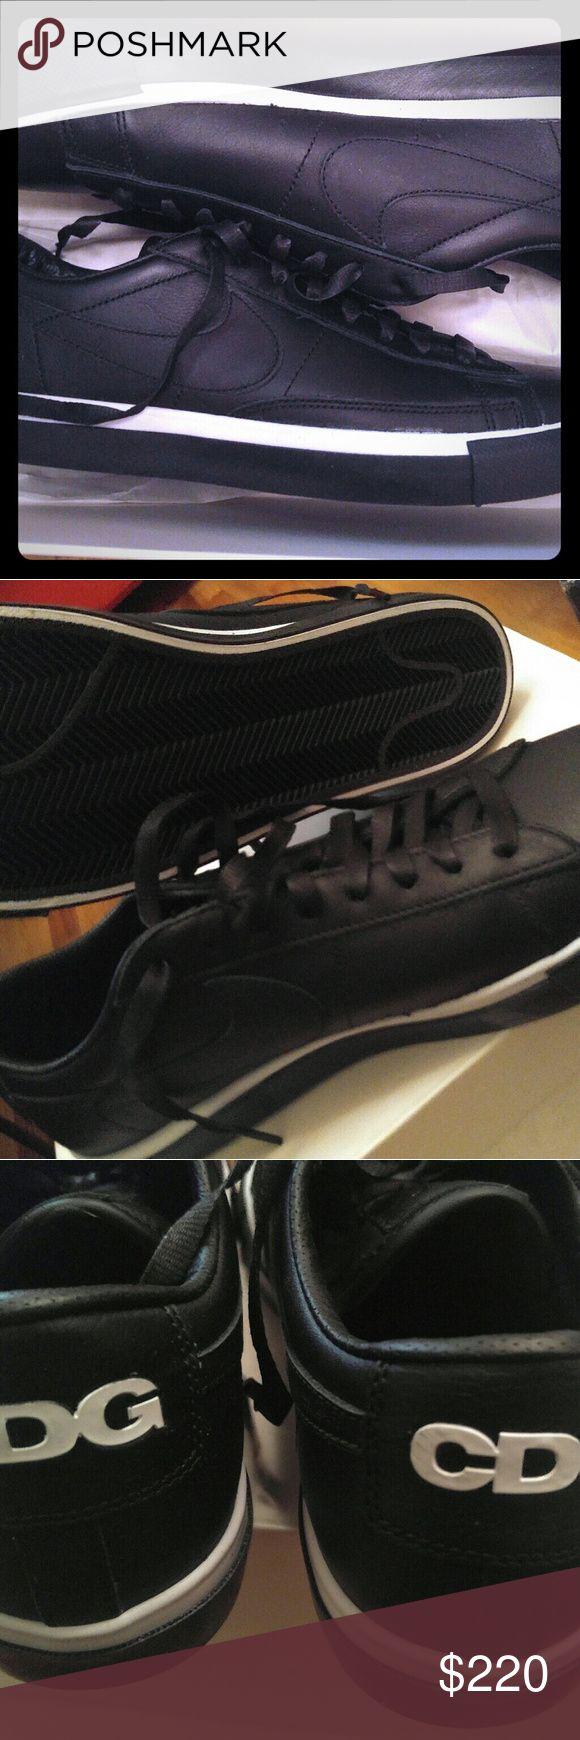 Nike CDG (Comme de Garcon) black leather Sneakers Nike CDG (Comme de Garcon) black leather Sneakers. Brand new open box  Nike CDG Comme des Garcon Shoes Sneakers